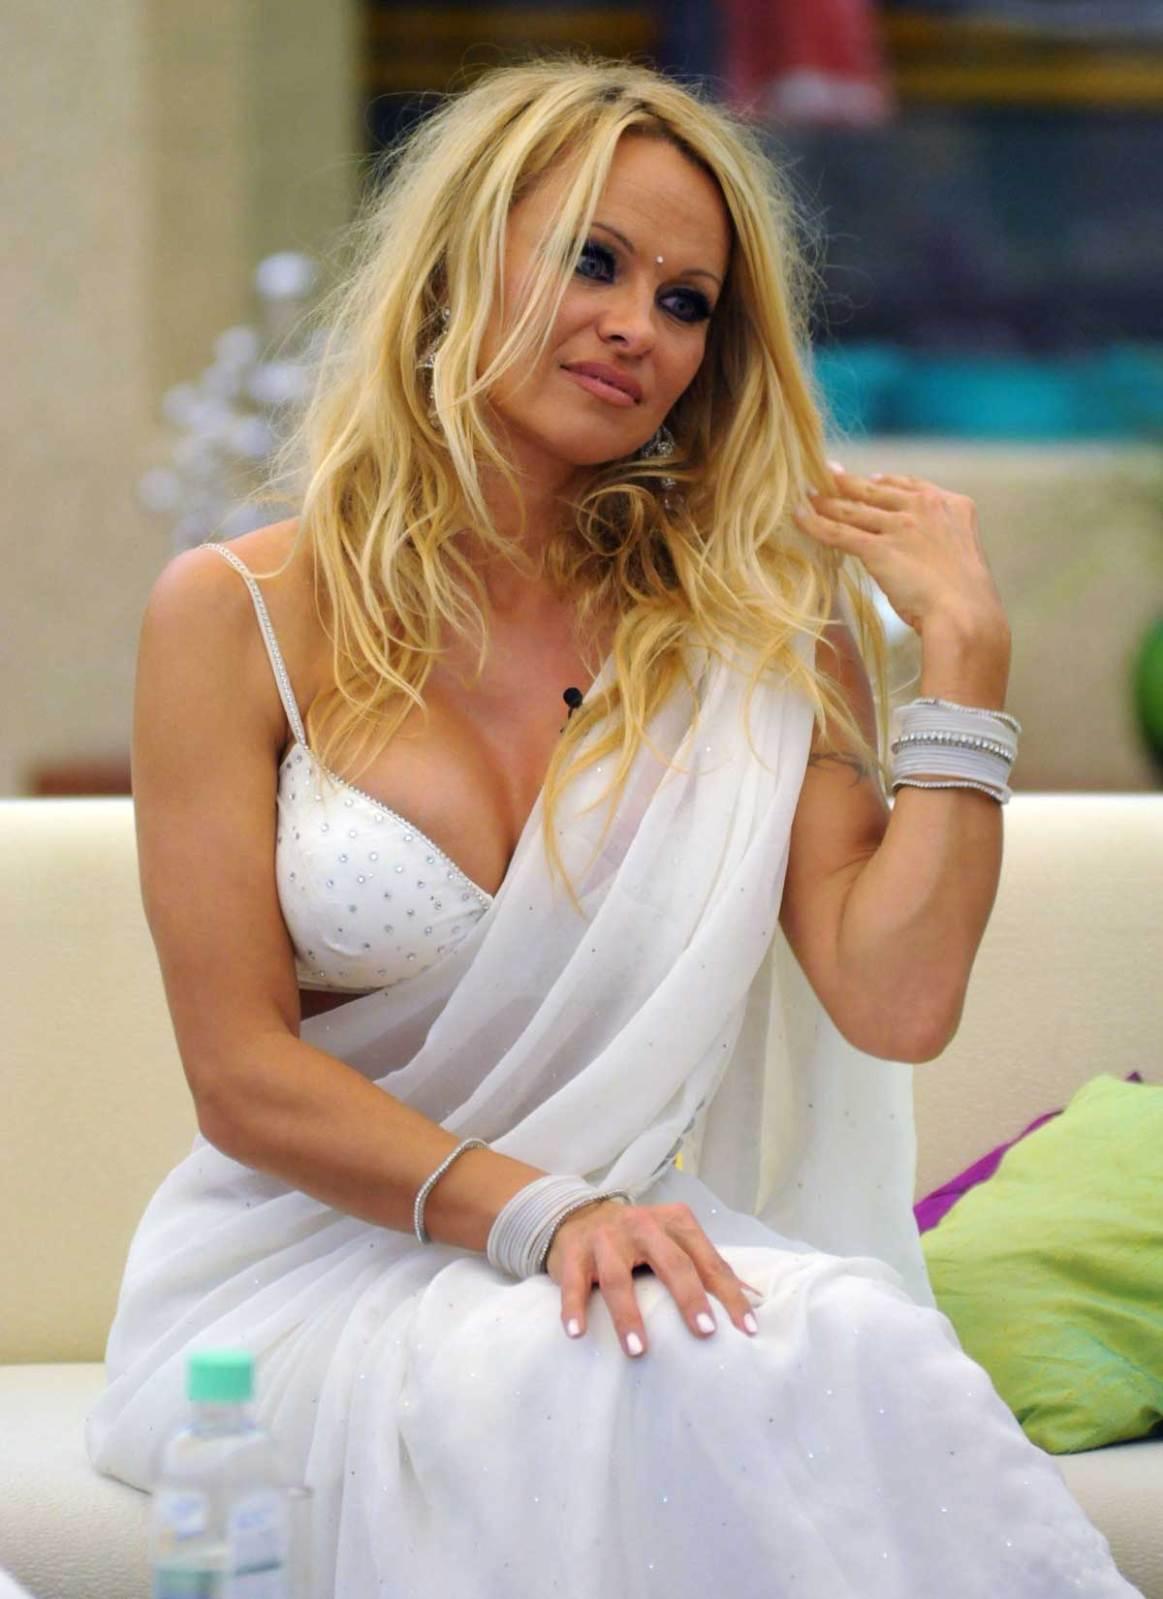 Hot Celebrity Gossip: Pamela Anderson in Sexy White Saree